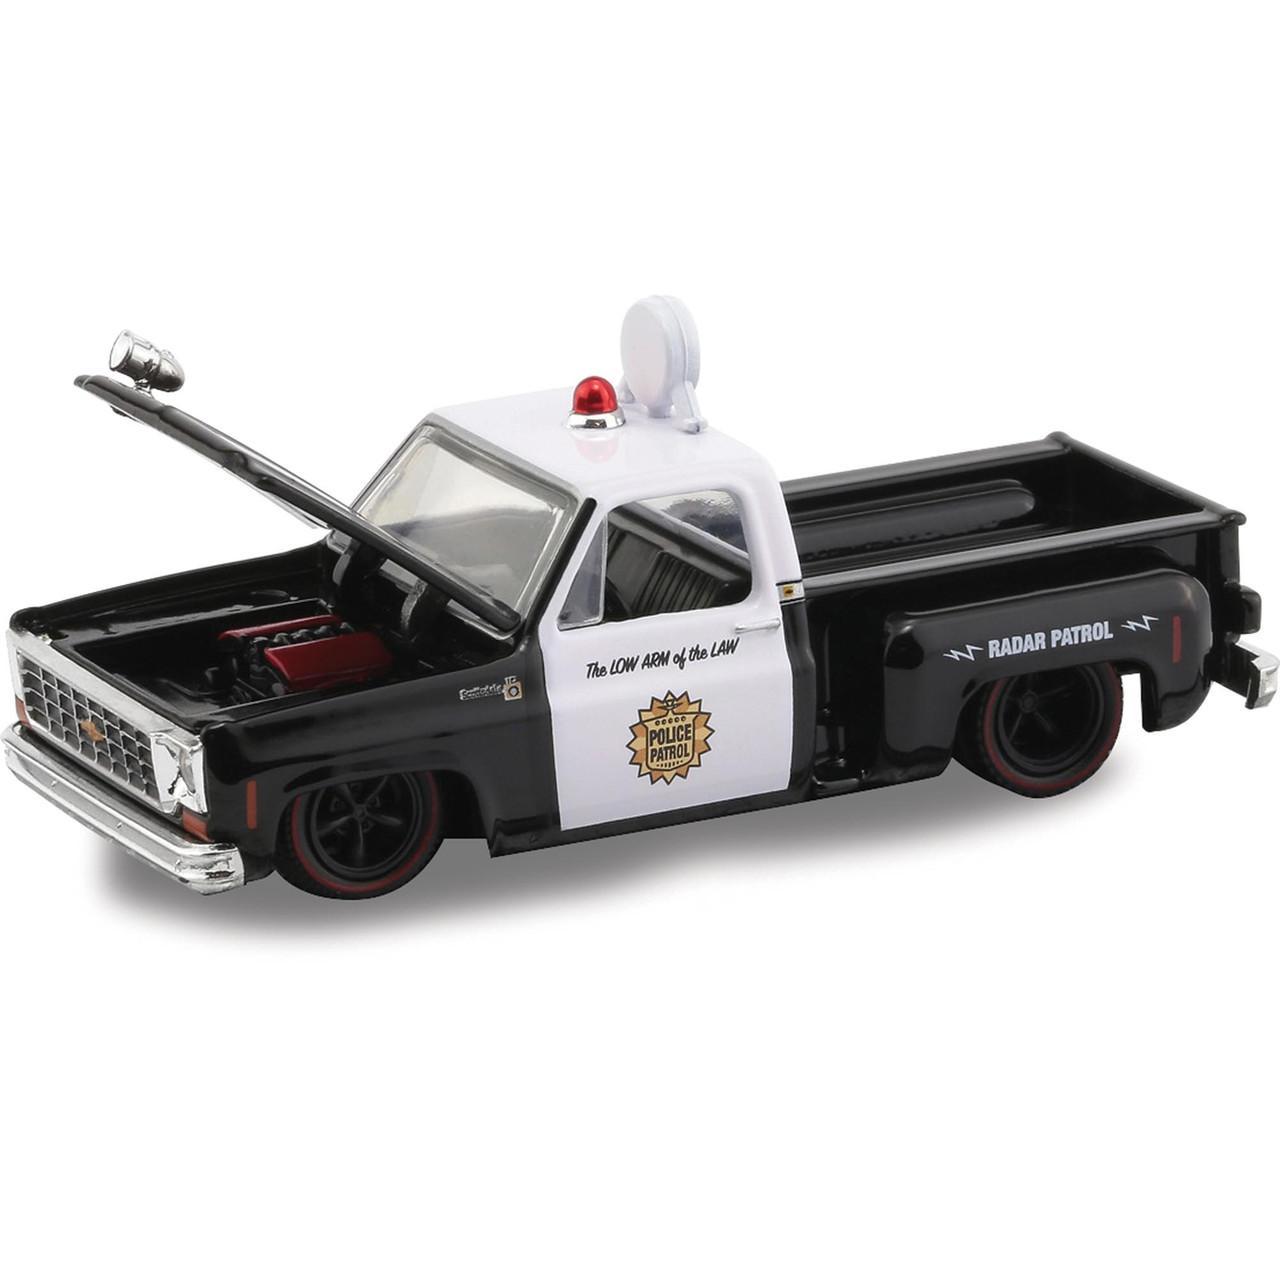 M2 31500 HS08 1976 CHEVROLET SCOTTSDALE PICK UP TRUCK 1//64 POLICE PATROL Chase